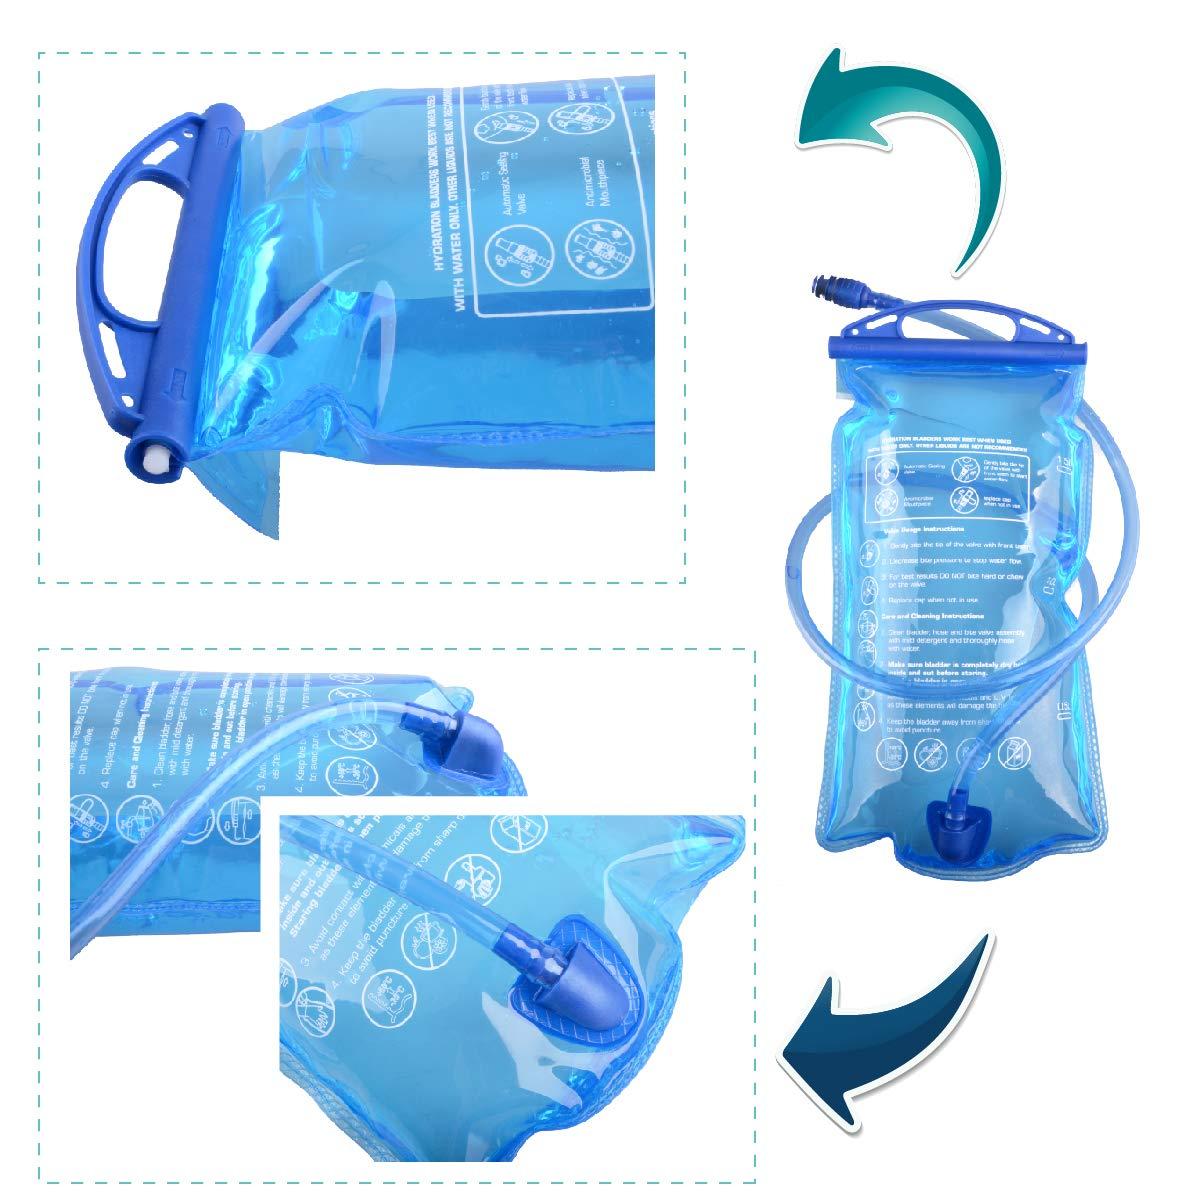 TRIWONDER TPU Bolsa de Agua Soft Flask 1.5-2-3L Vejiga de Hidratación Deportivas sin BPA a Prueba de Fugas Ideal para Mochila de Hidratación para Correr ...